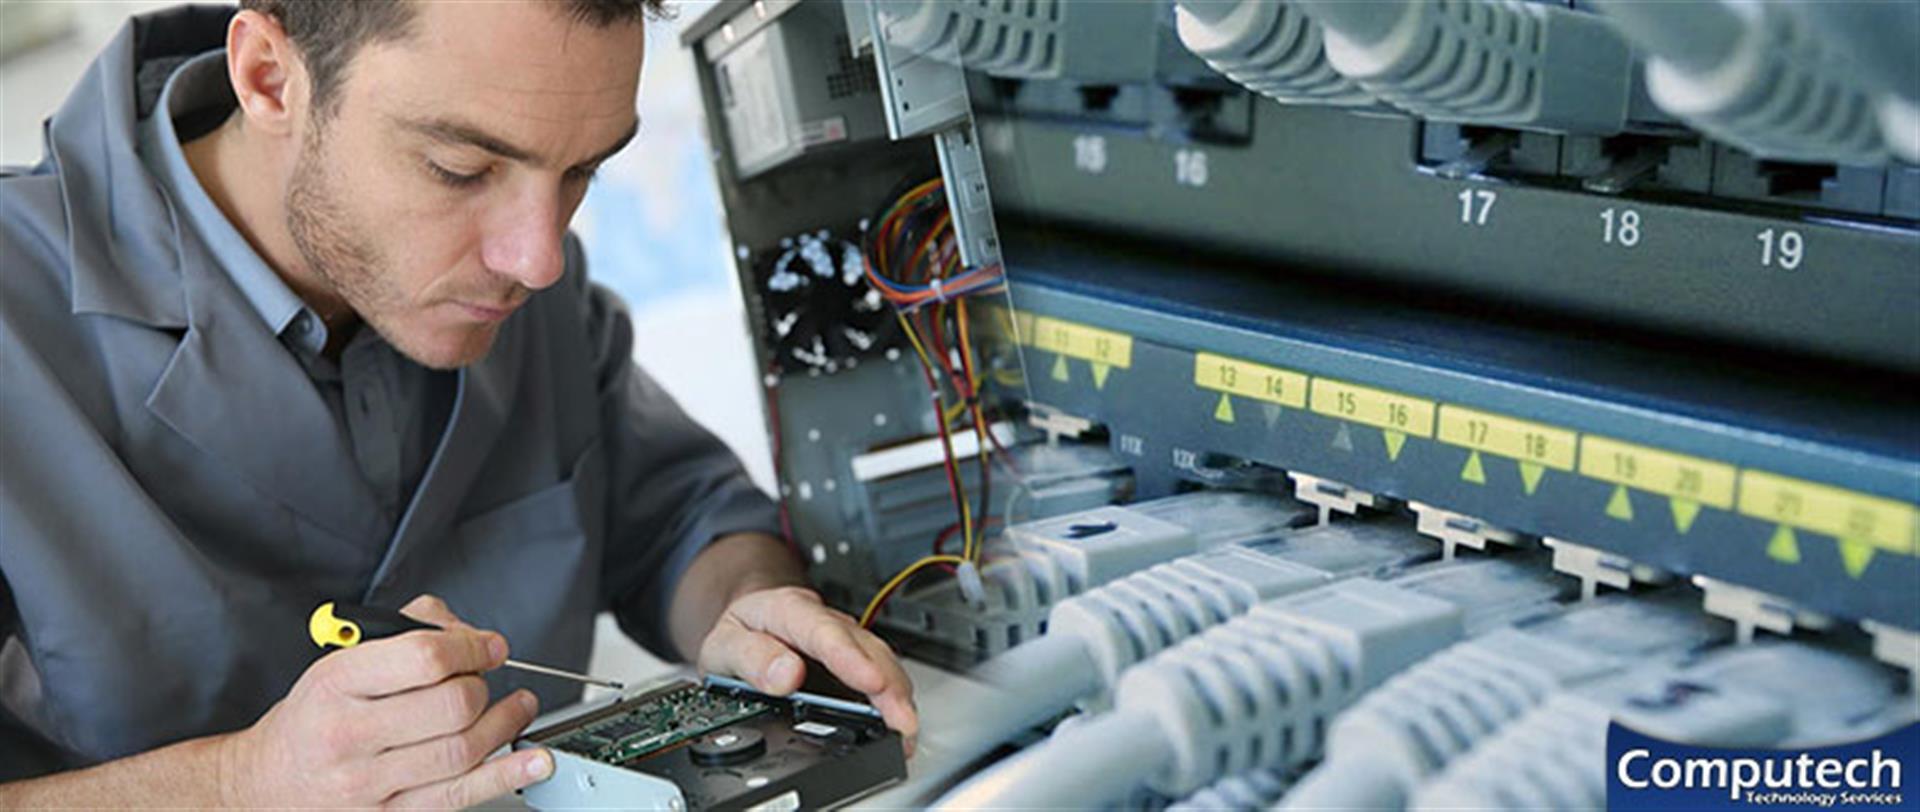 Salem Virginia Onsite Computer PC & Printer Repairs, Network, Voice & Data Cabling Services